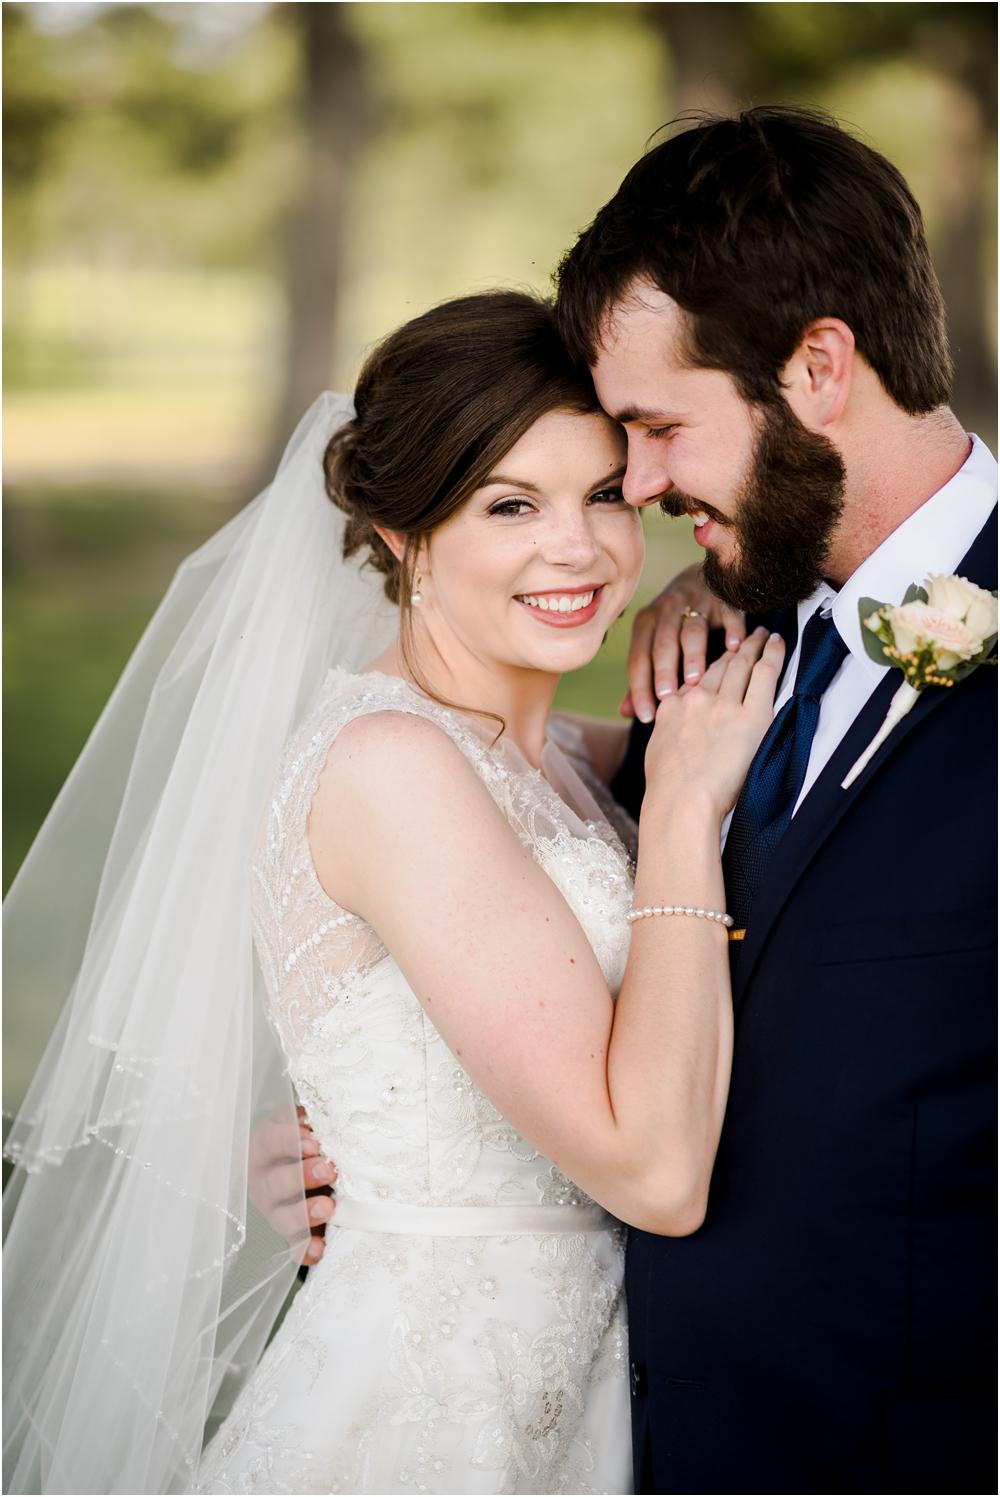 marianna-florida-wedding-photographer-kiersten-grant-69.jpg